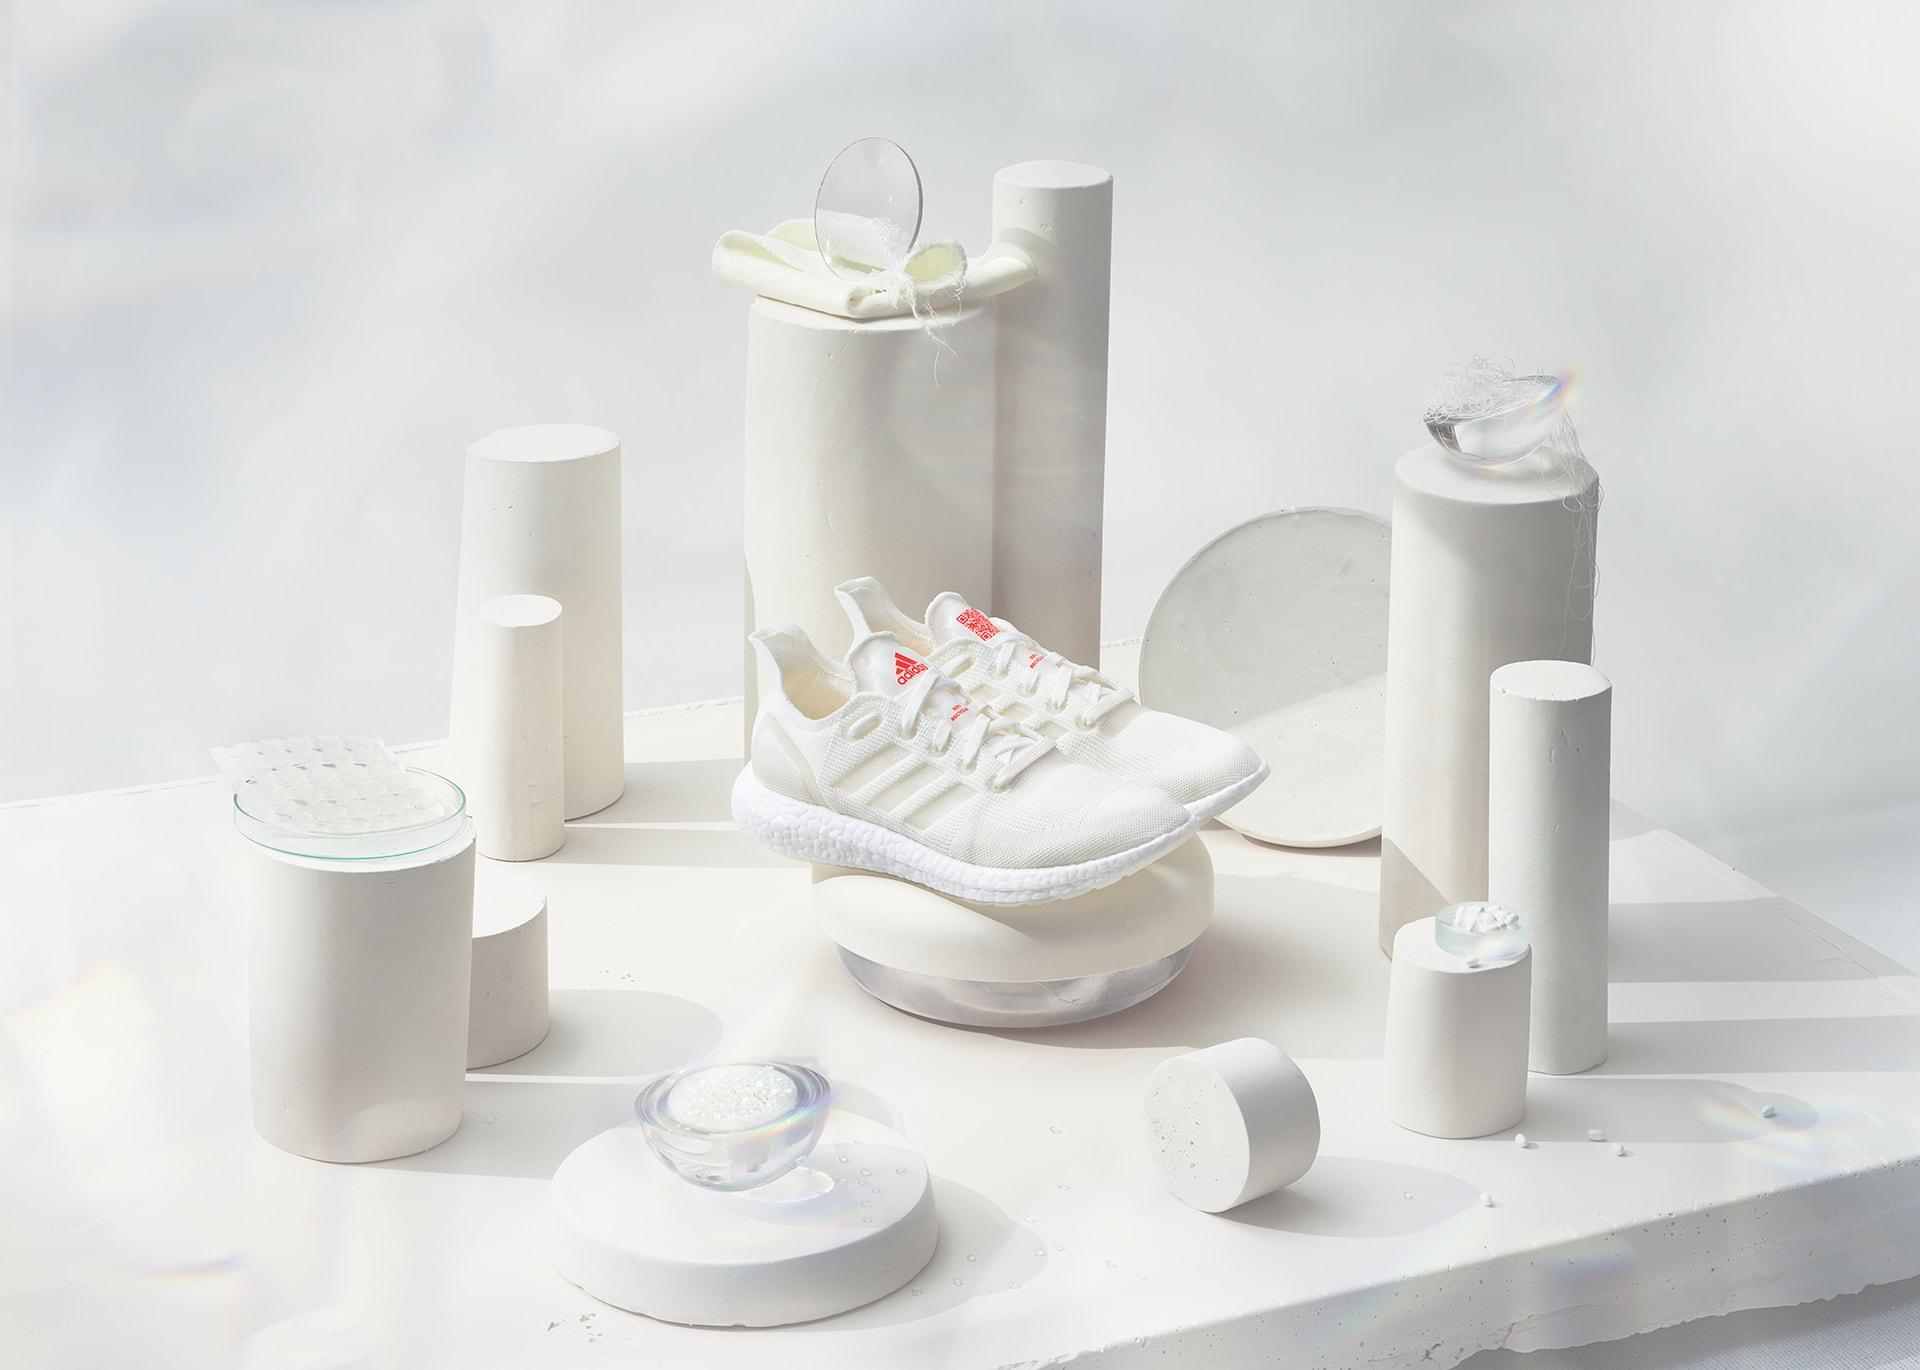 Adidas Futurecraft.Loop 4